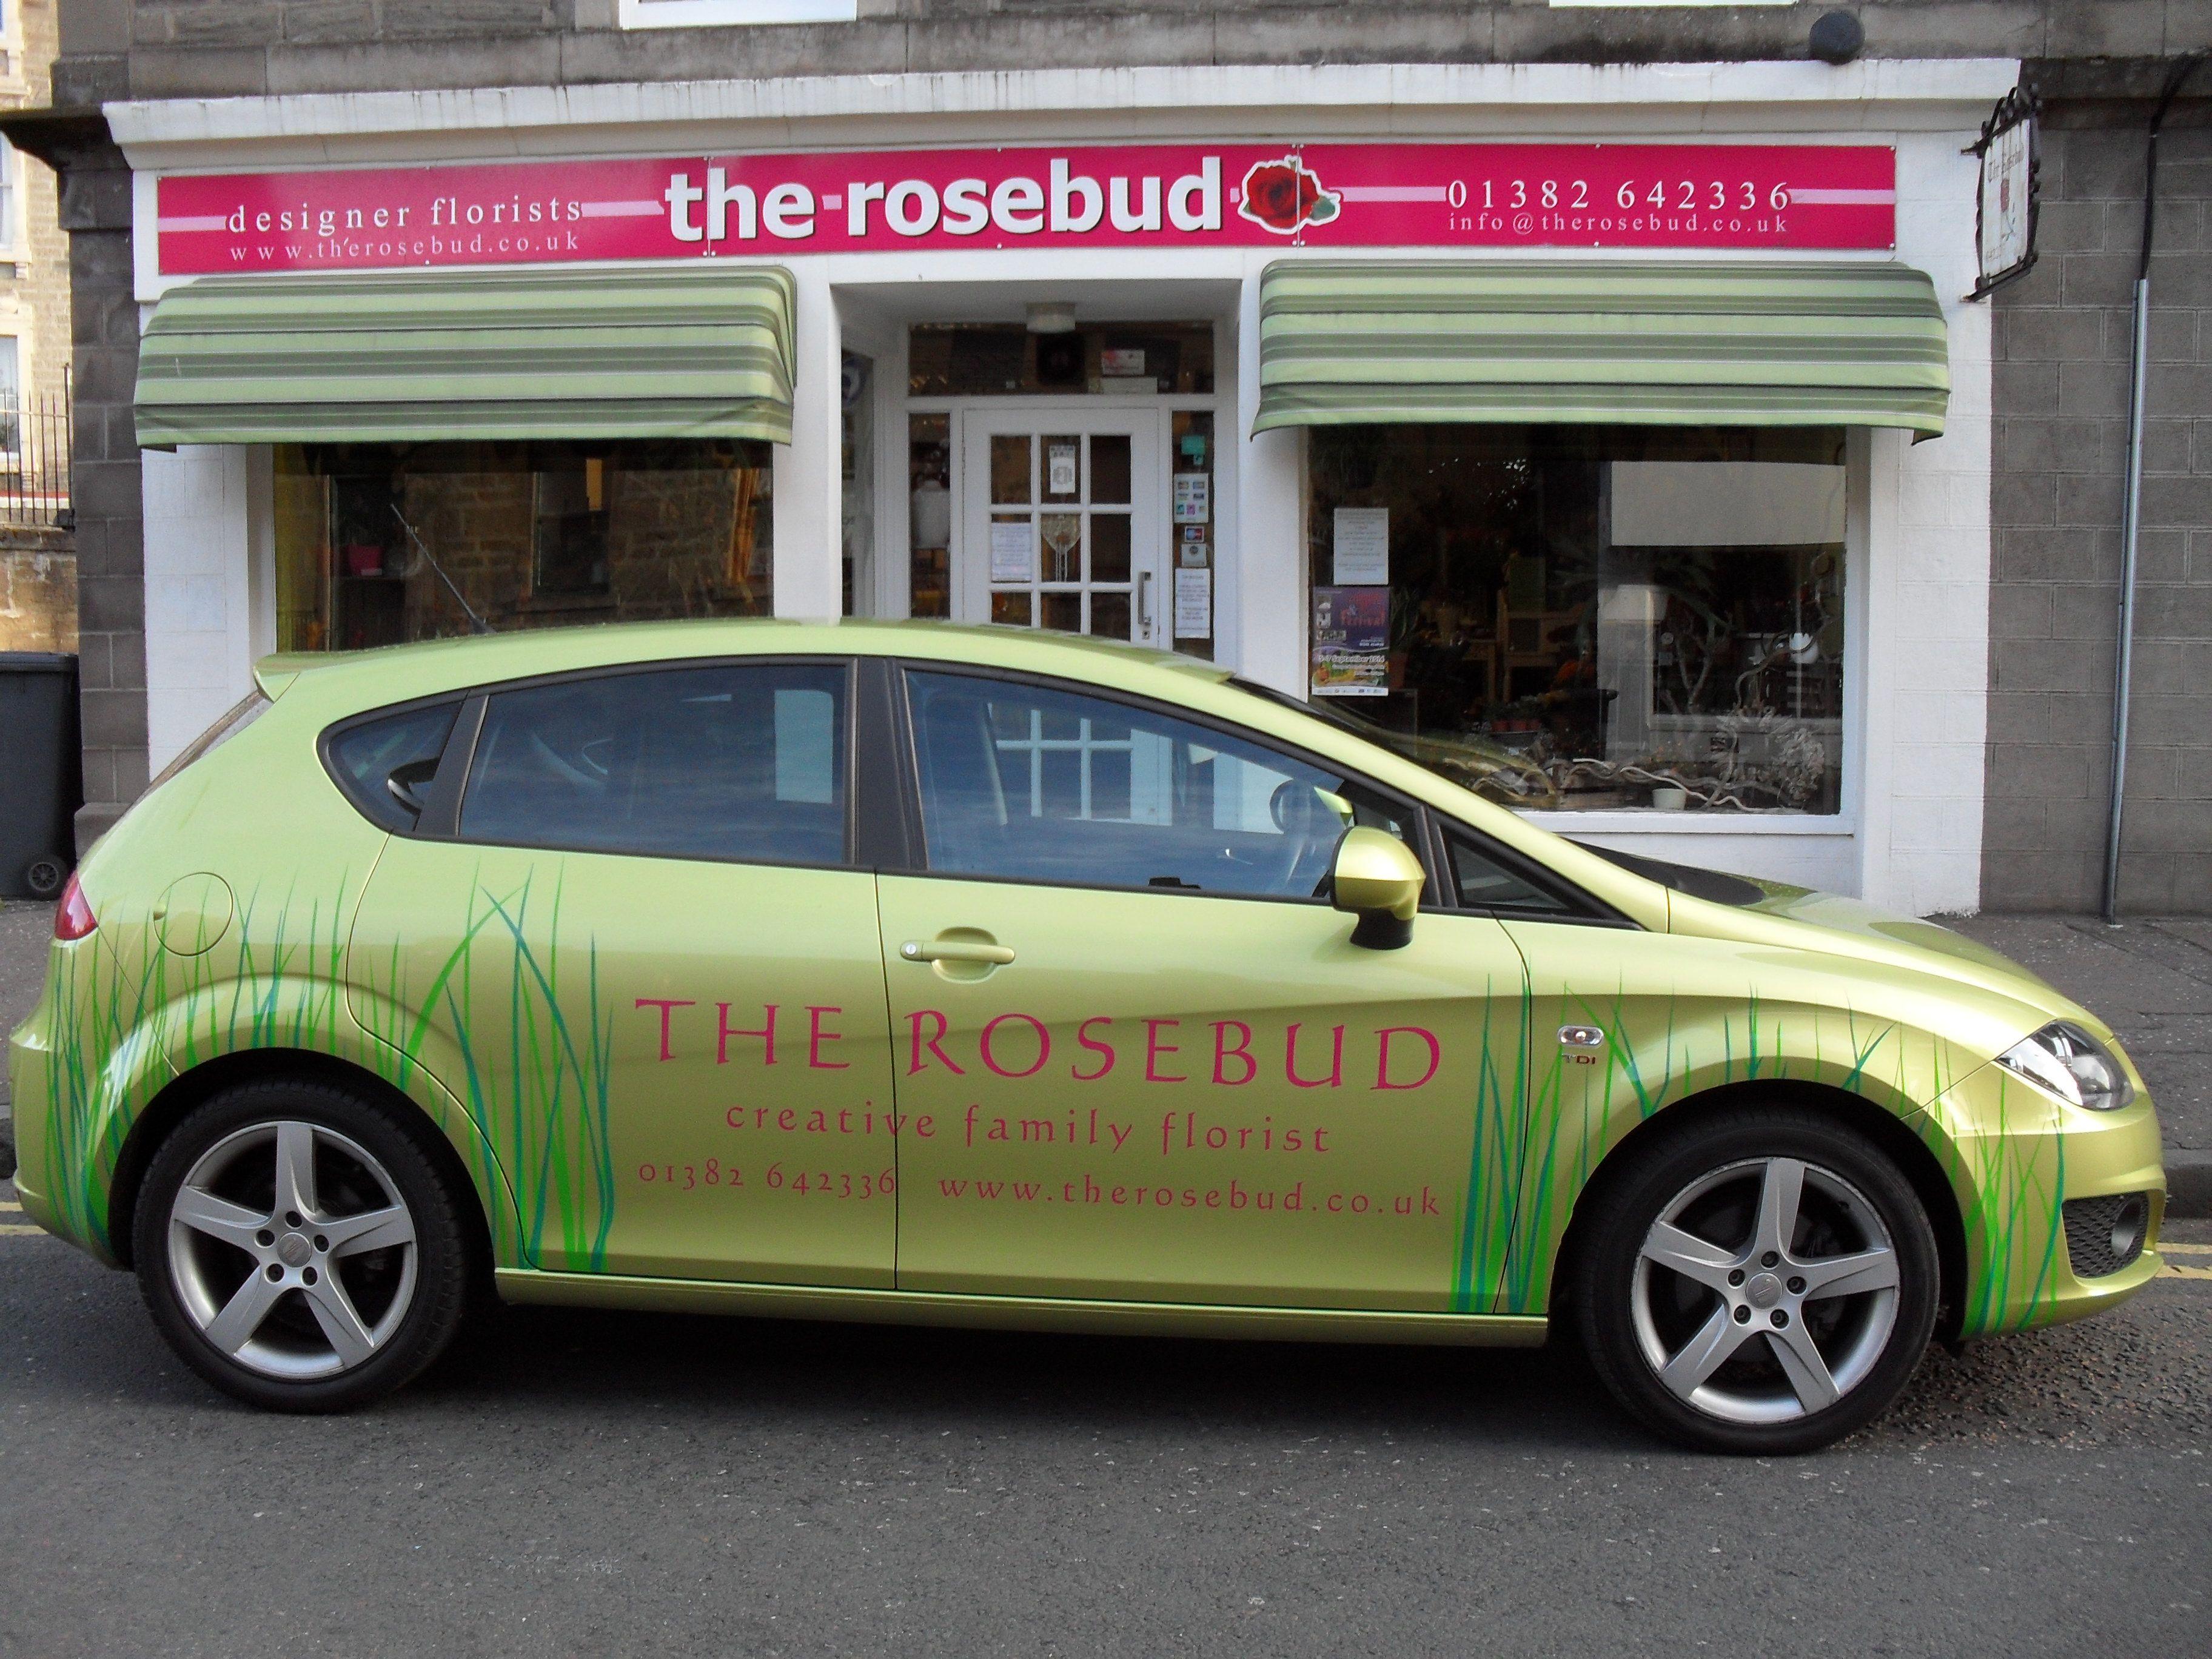 The rosebud in Angus Angus The Rosebud Flower Shop Dundee